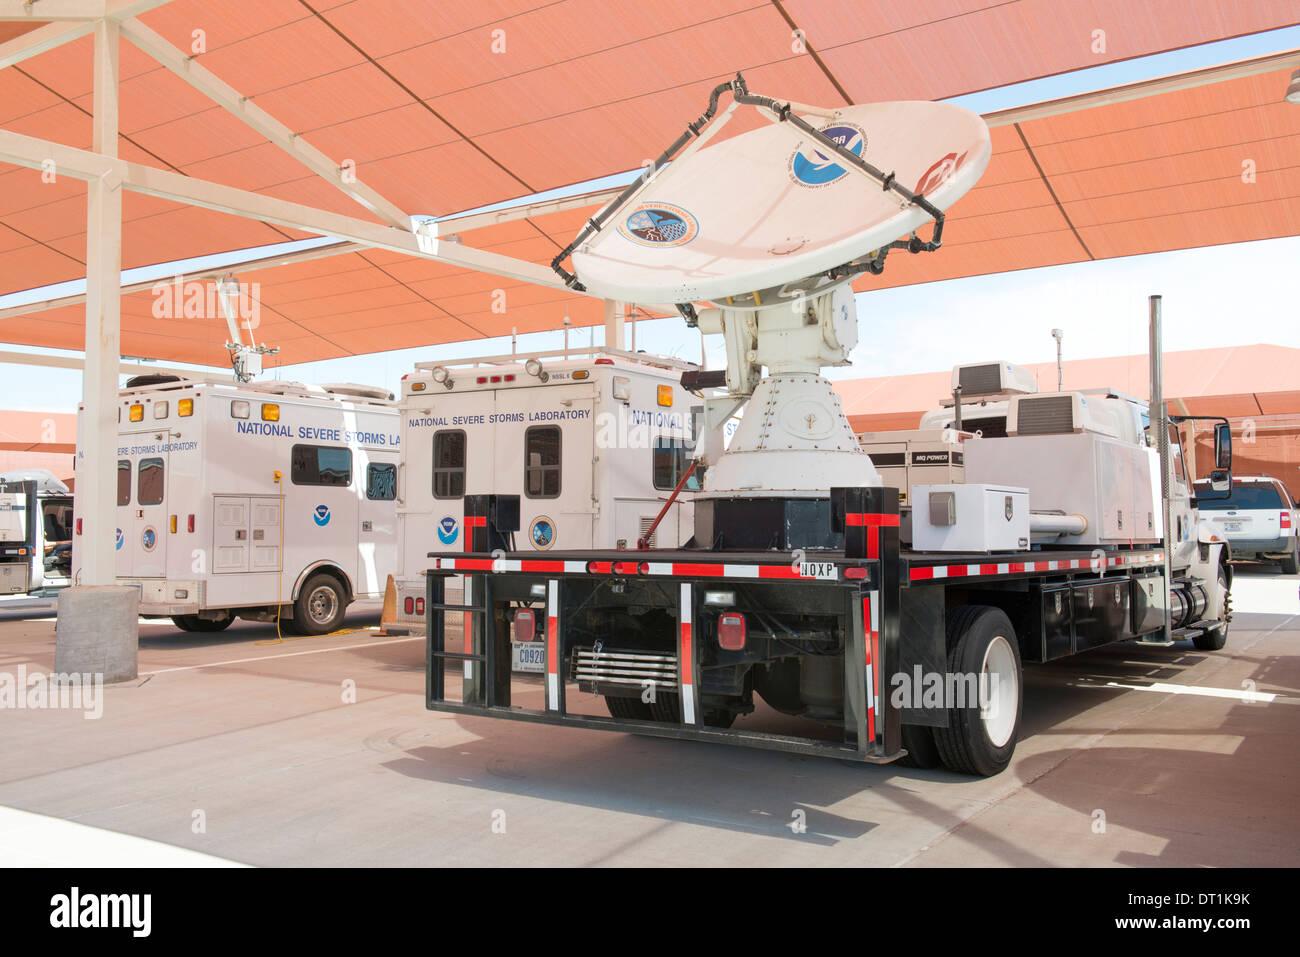 Dual-polarized X-Band mobile radar known as NOAA X-POL (NOXP